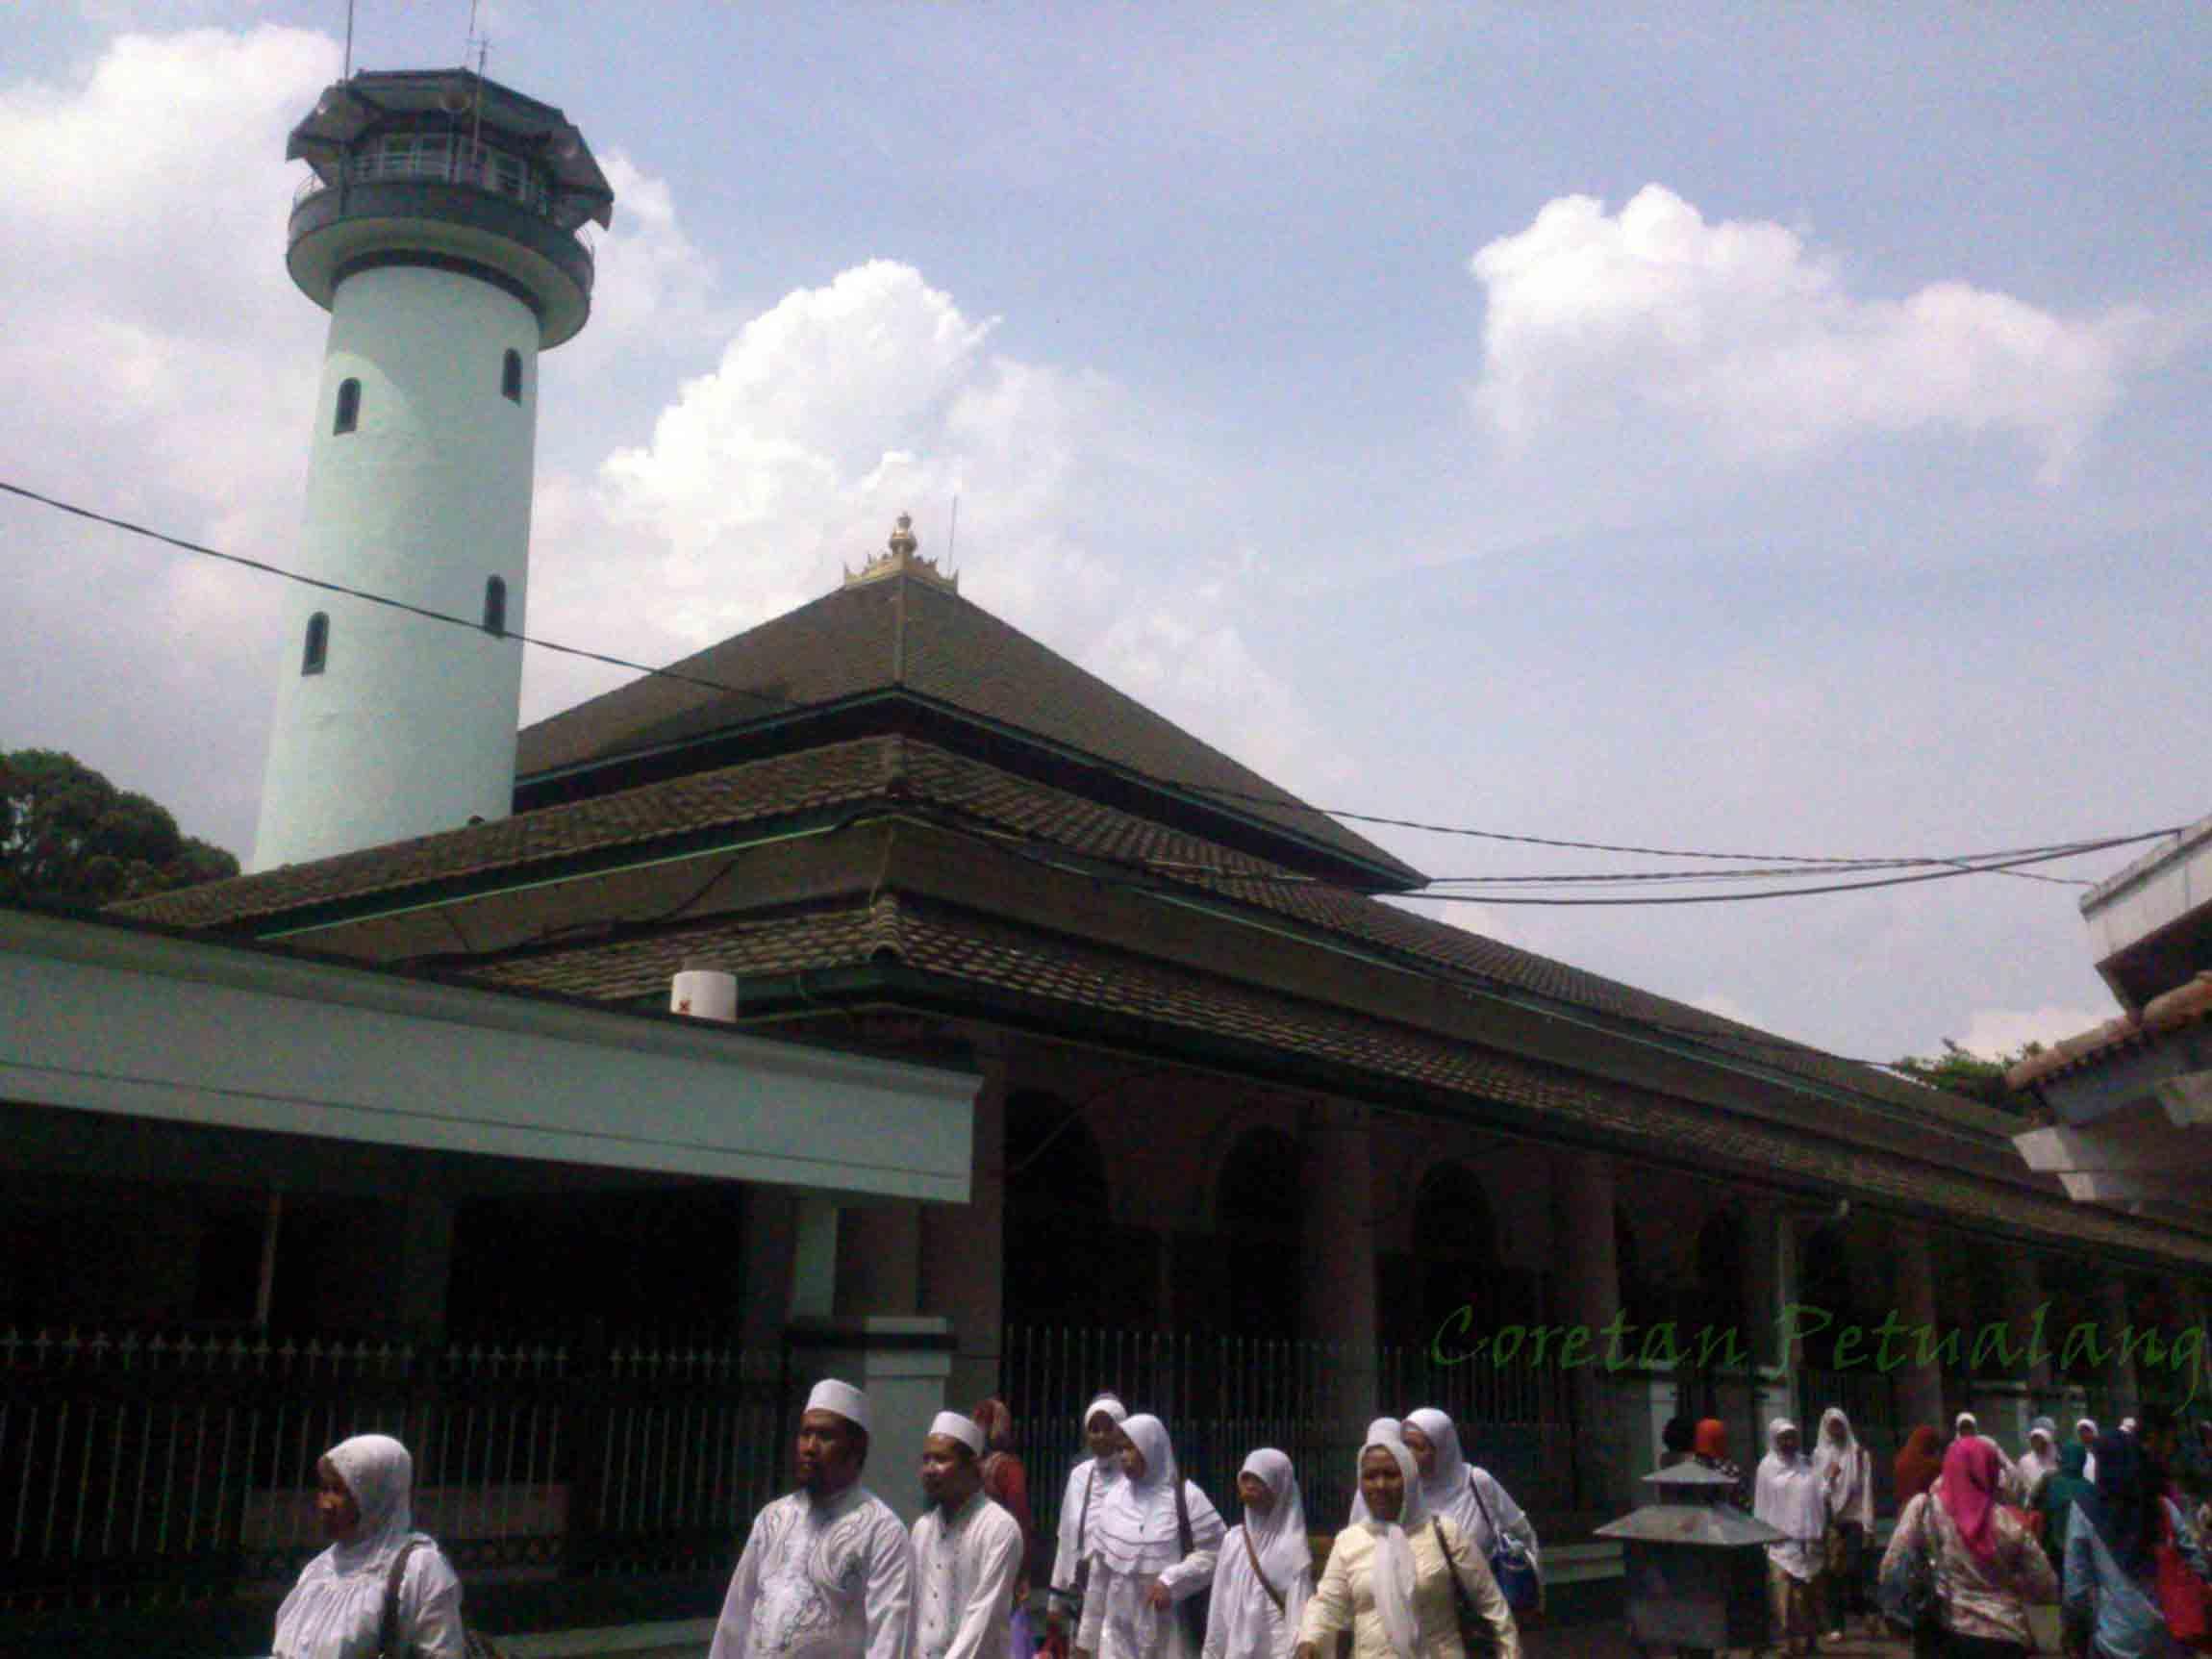 Masjid Ampel Saksi Pendakwah Tanah Jawa Bagian Pertama Surabaya Kota